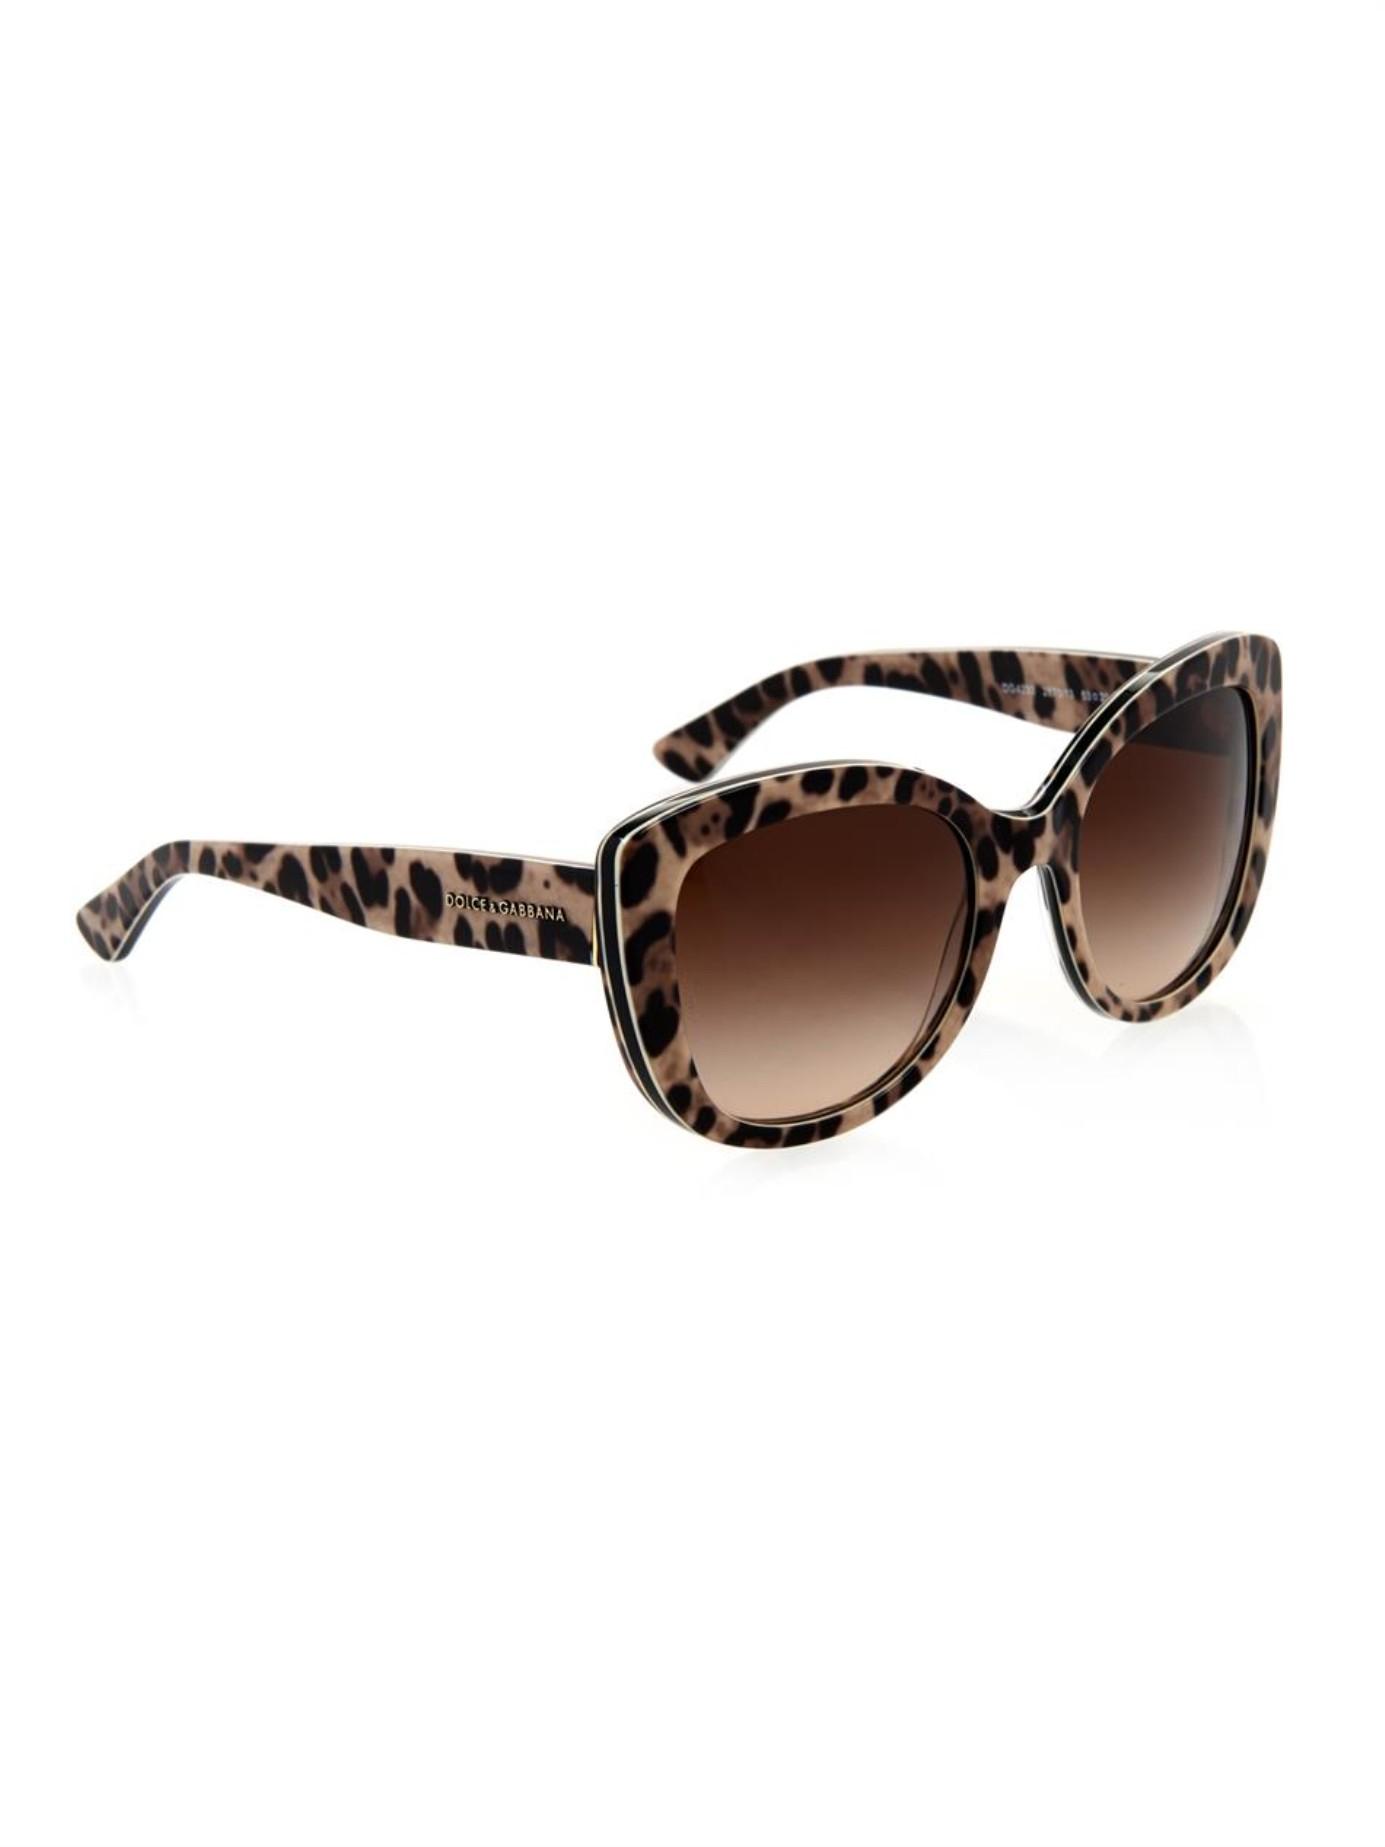 559f9bd787 Dolce   Gabbana Leopard-Print Cat-Eye Sunglasses - Lyst